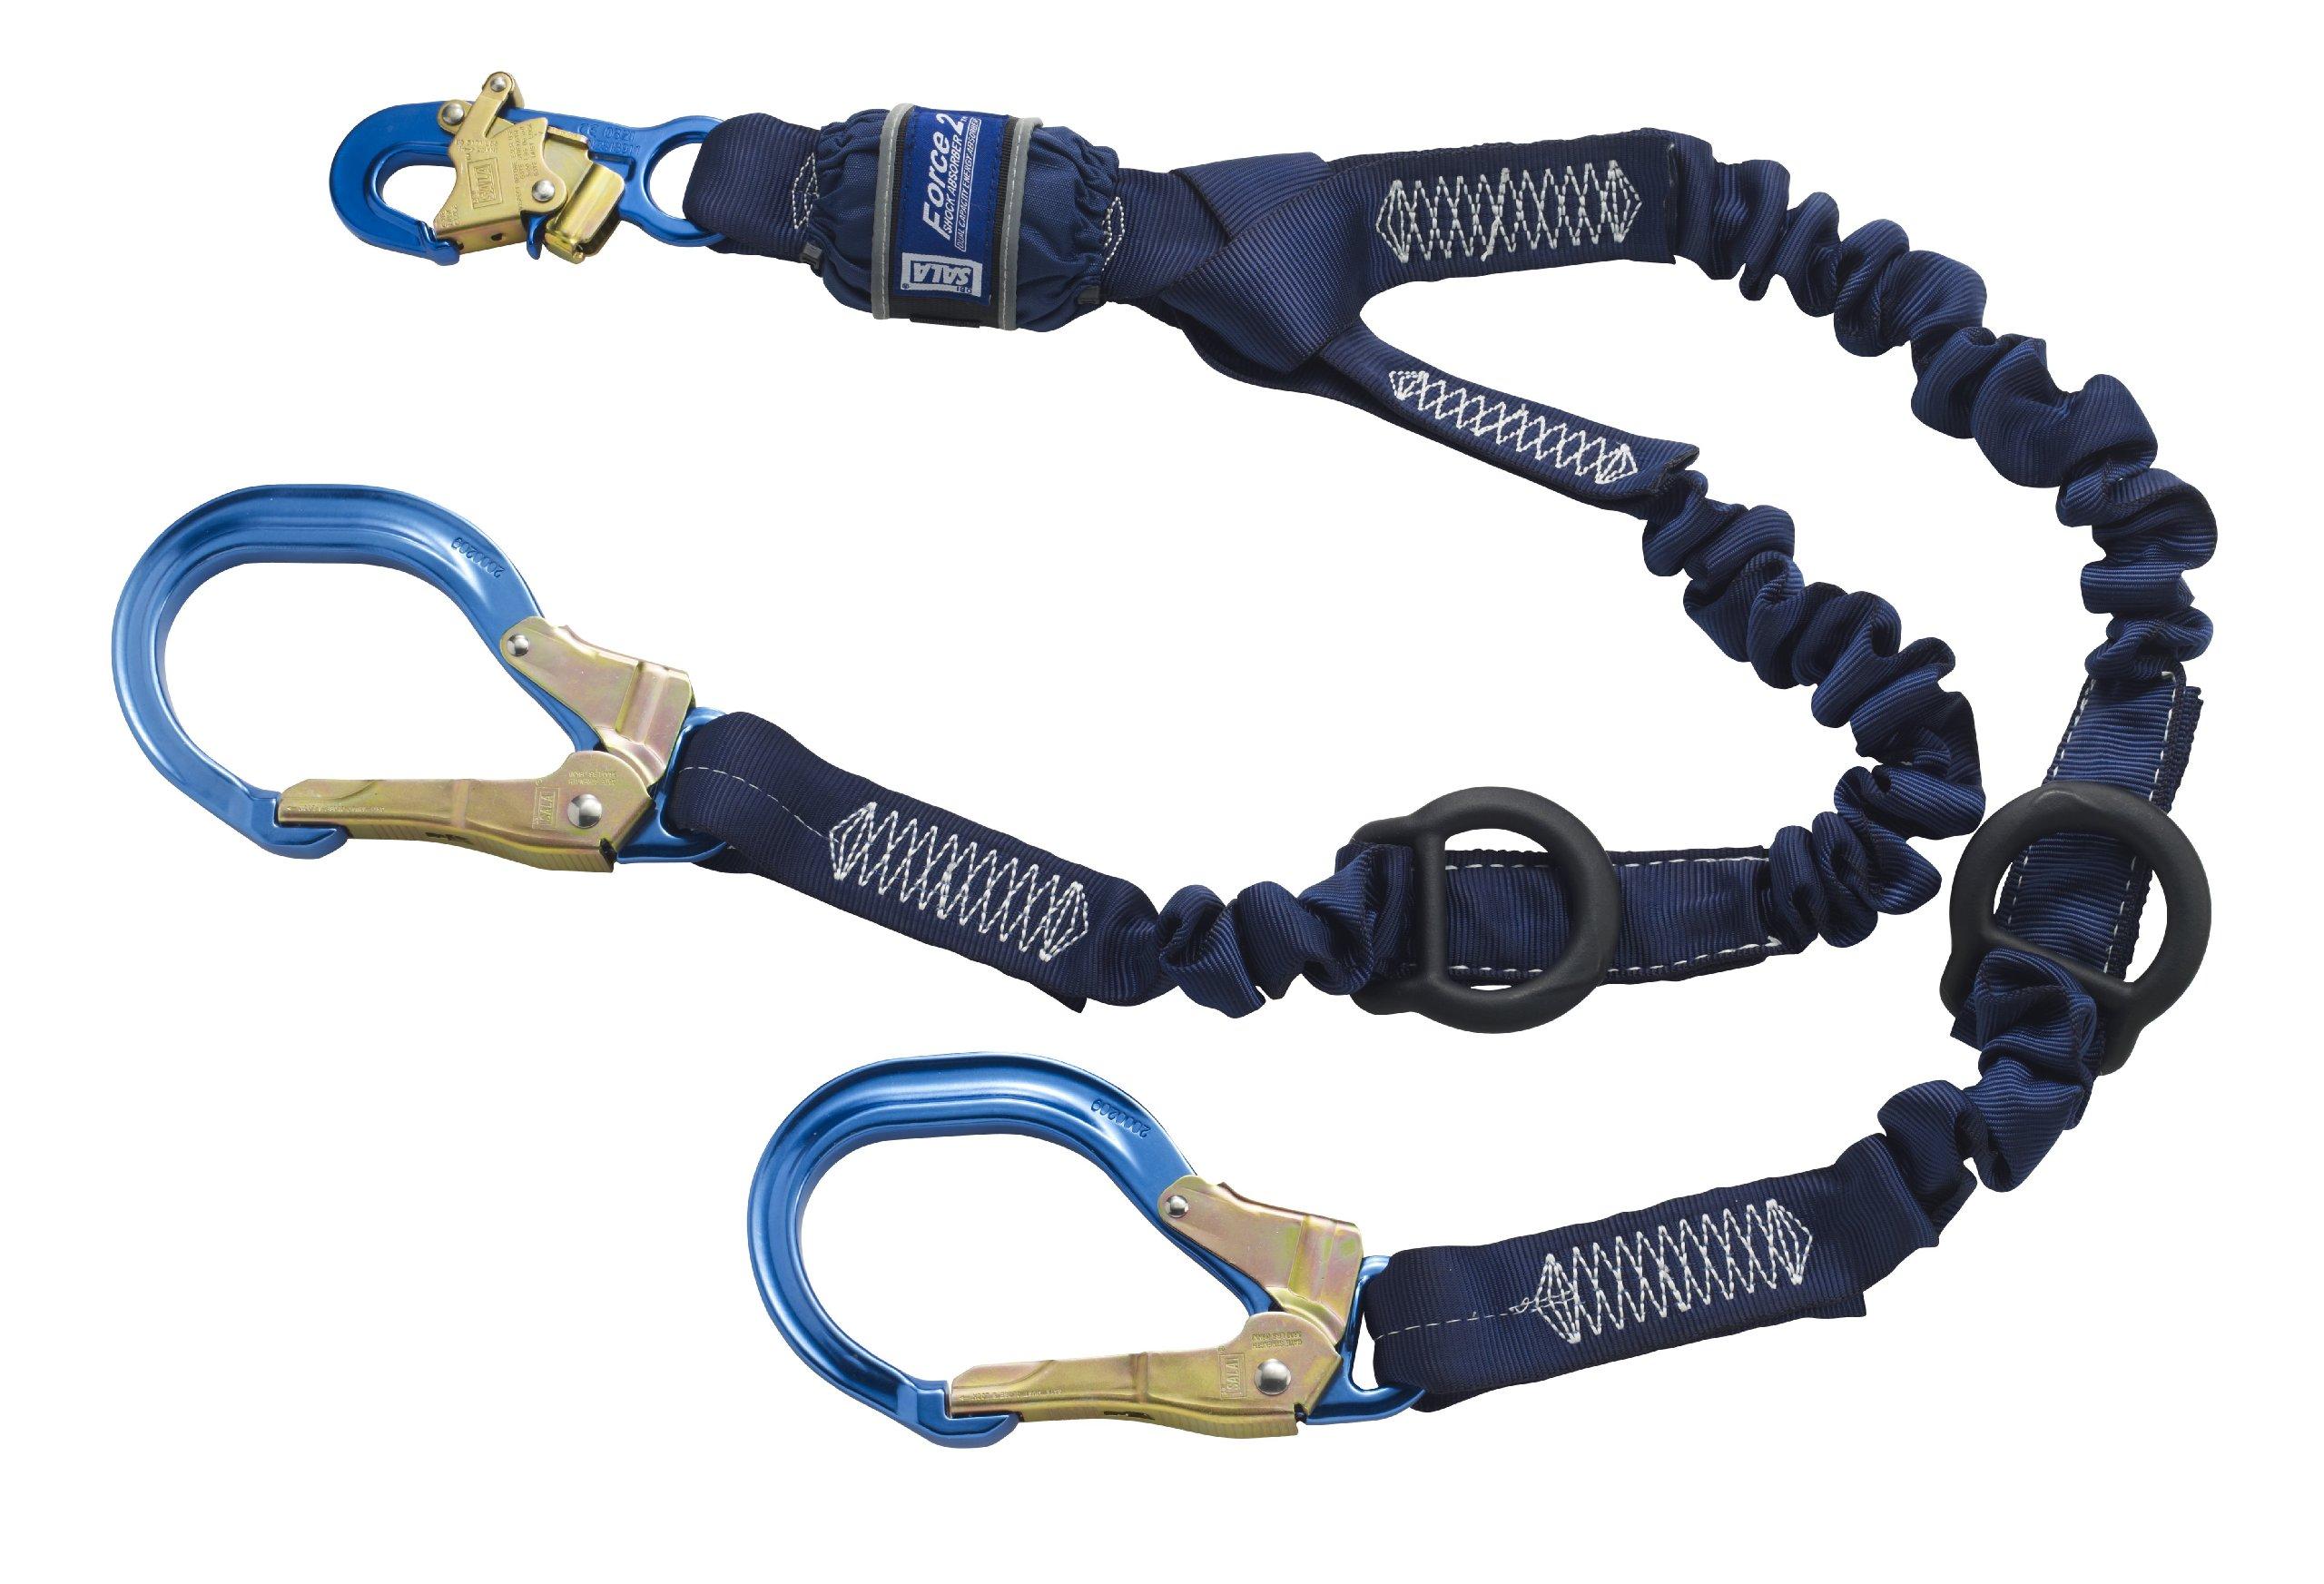 3M DBI-SALA SHOCKWAVE Force2 1246032 Shock Absorbing Lanyard, Snap Hook One End, Alum Rebar 25'' Opening Hooks Leg Ends, Rescue D-Rings Ends, 6